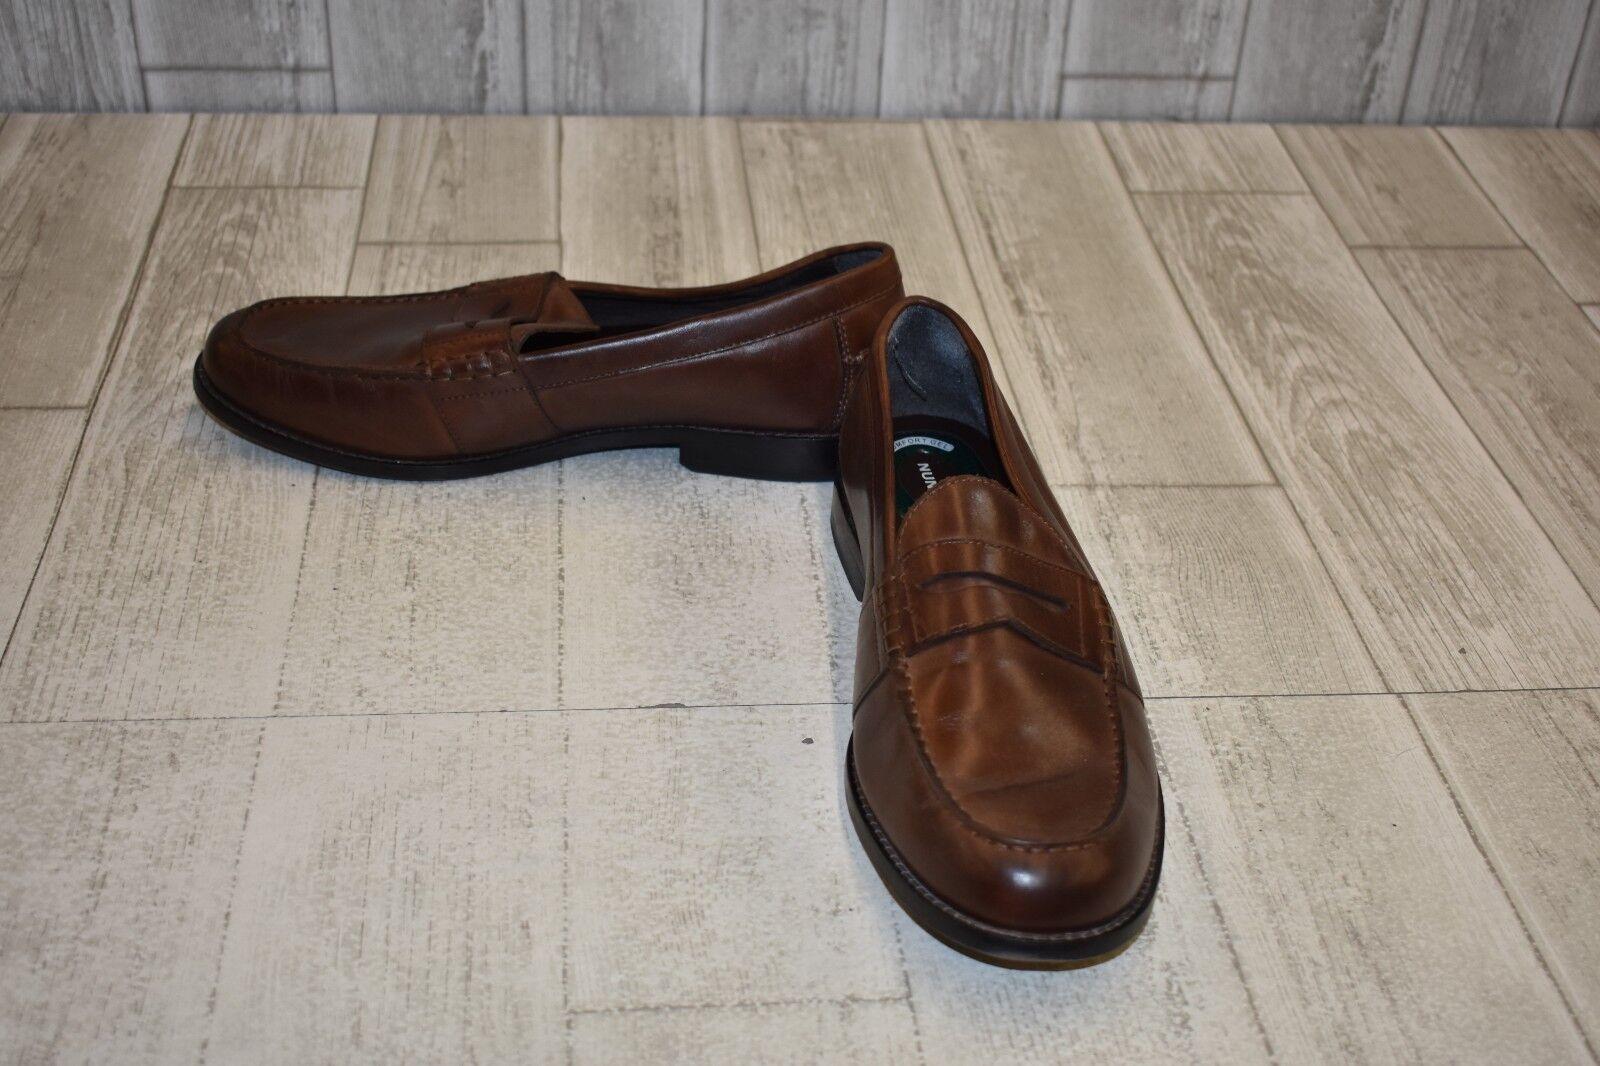 Nunn Bush Noah Beef Roll Penny Loafer - Men's Size 11 M - Brown